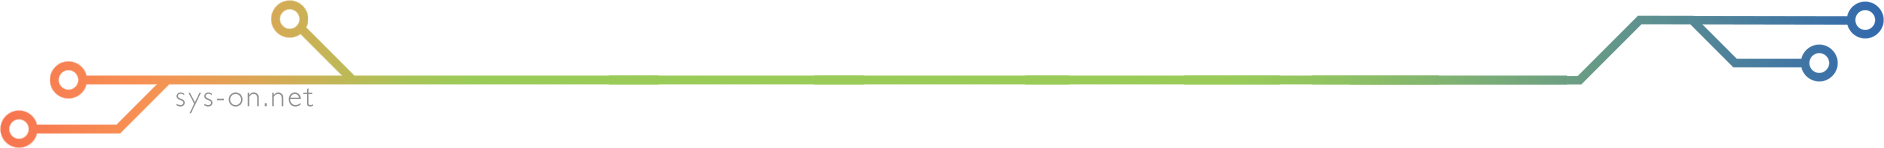 SeparatorNet - سامسونج تعلن رسميًا عن نوت 9 ، تعرف على مواصفاته وسعره وموعد إتاحته في الأسواق